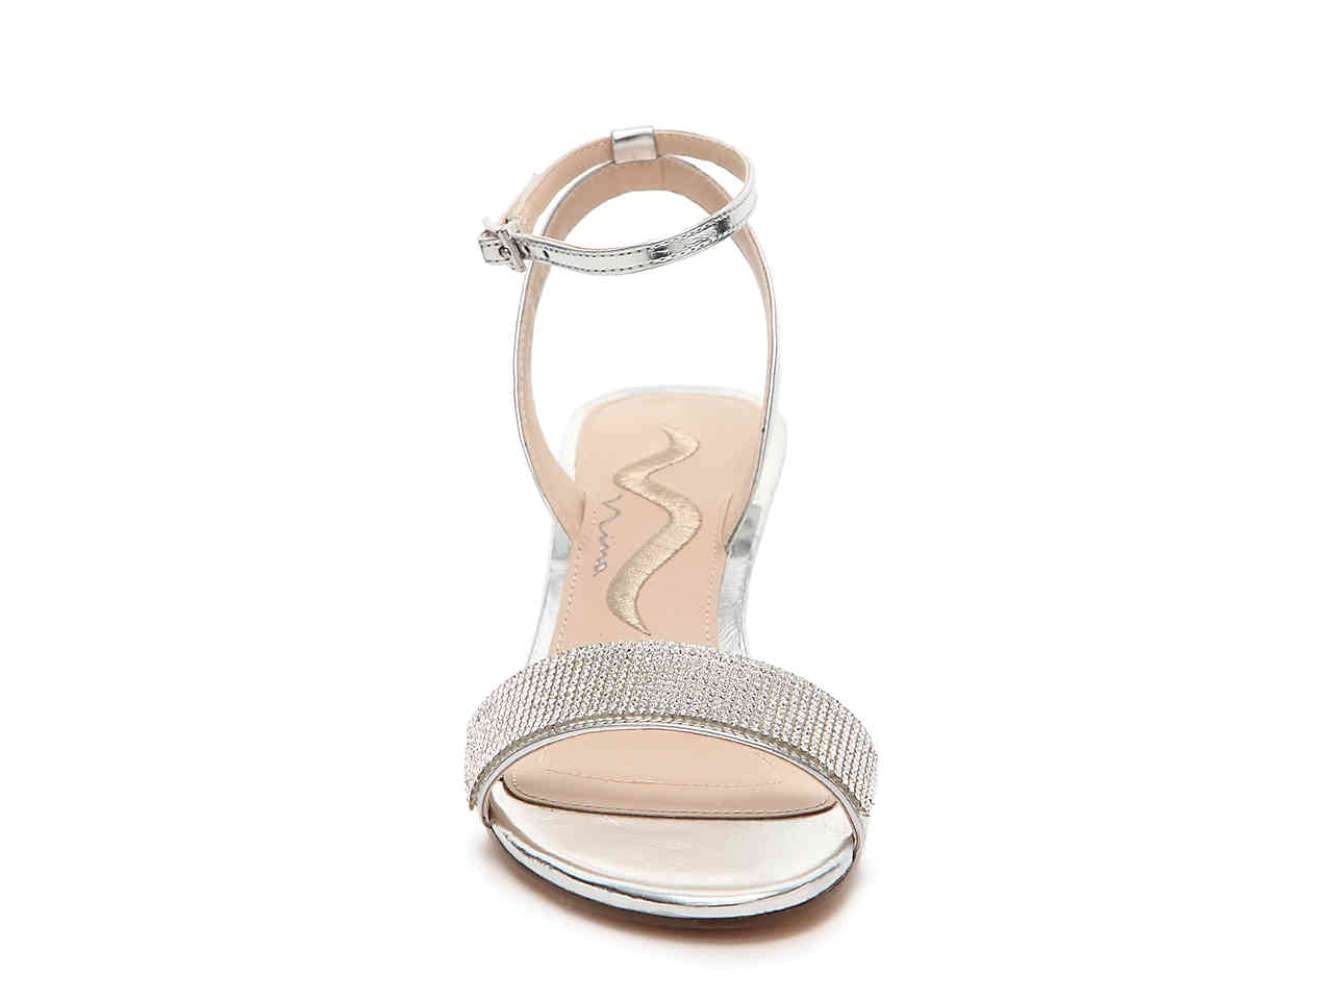 dd19925f141 Nina Womens nolia Fabric Open Toe Special Occasion Platform